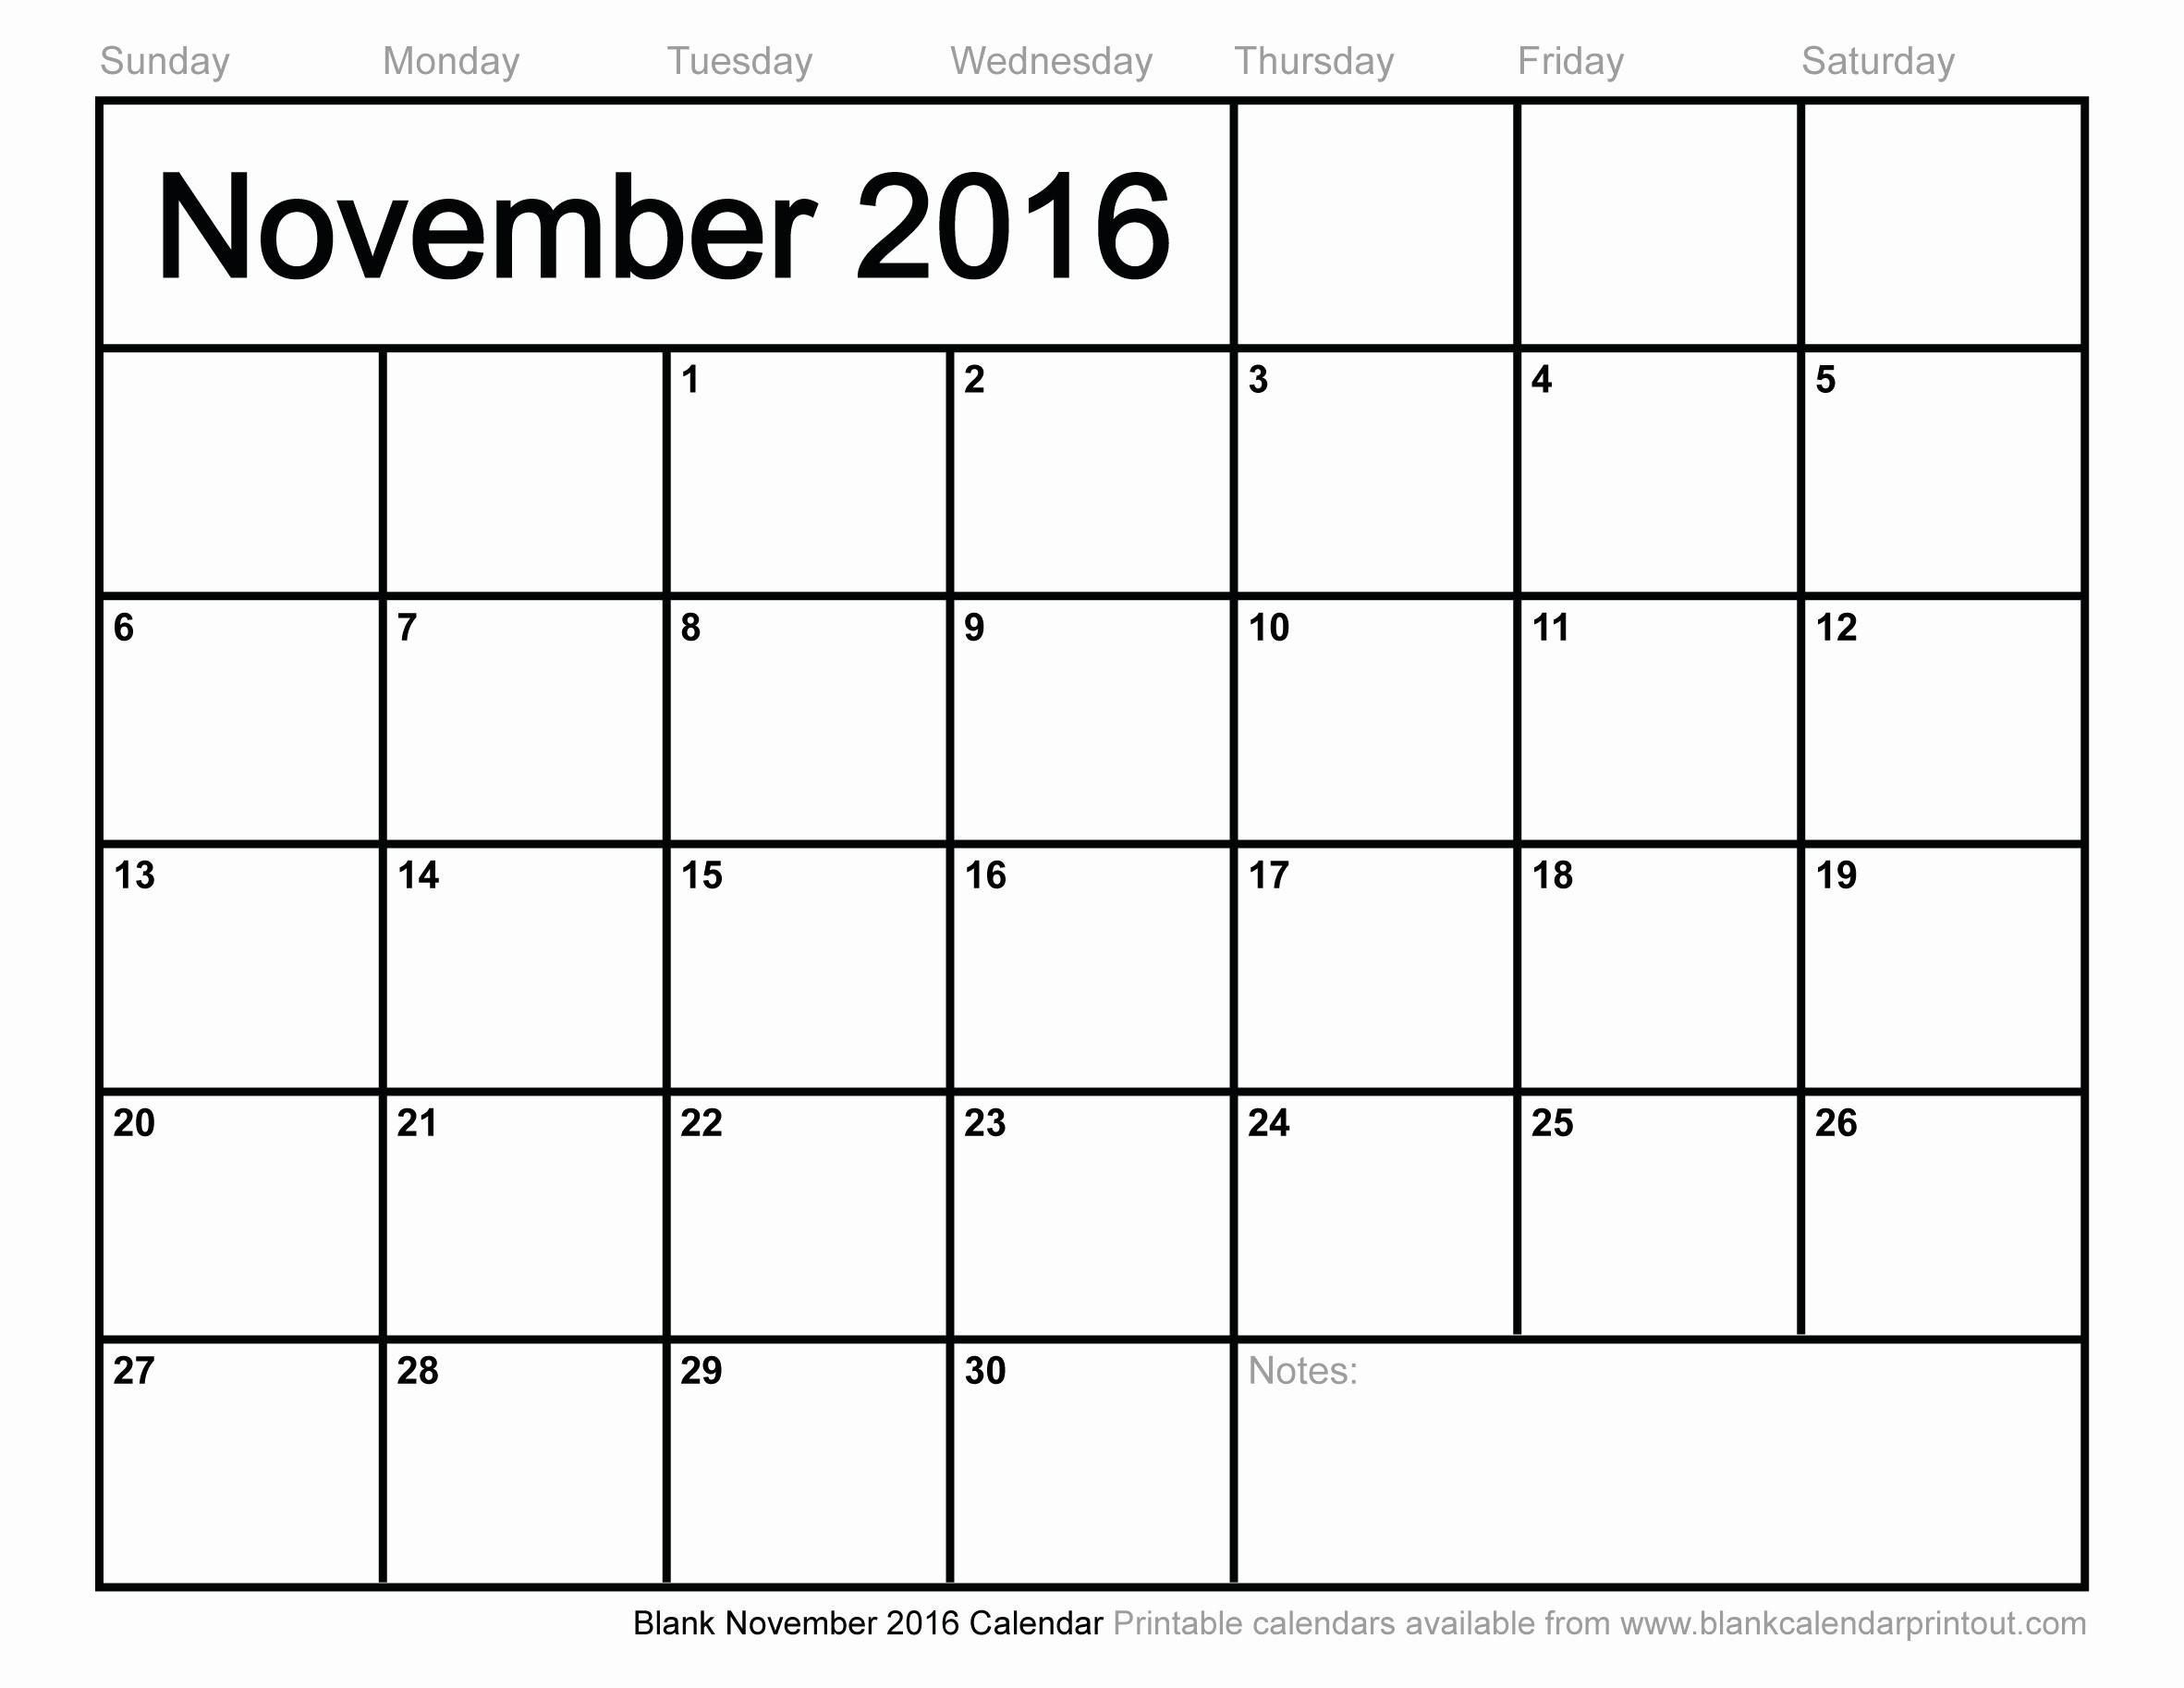 Blank December Calendar 2016 Printable Beautiful Blank November 2016 Calendar to Print